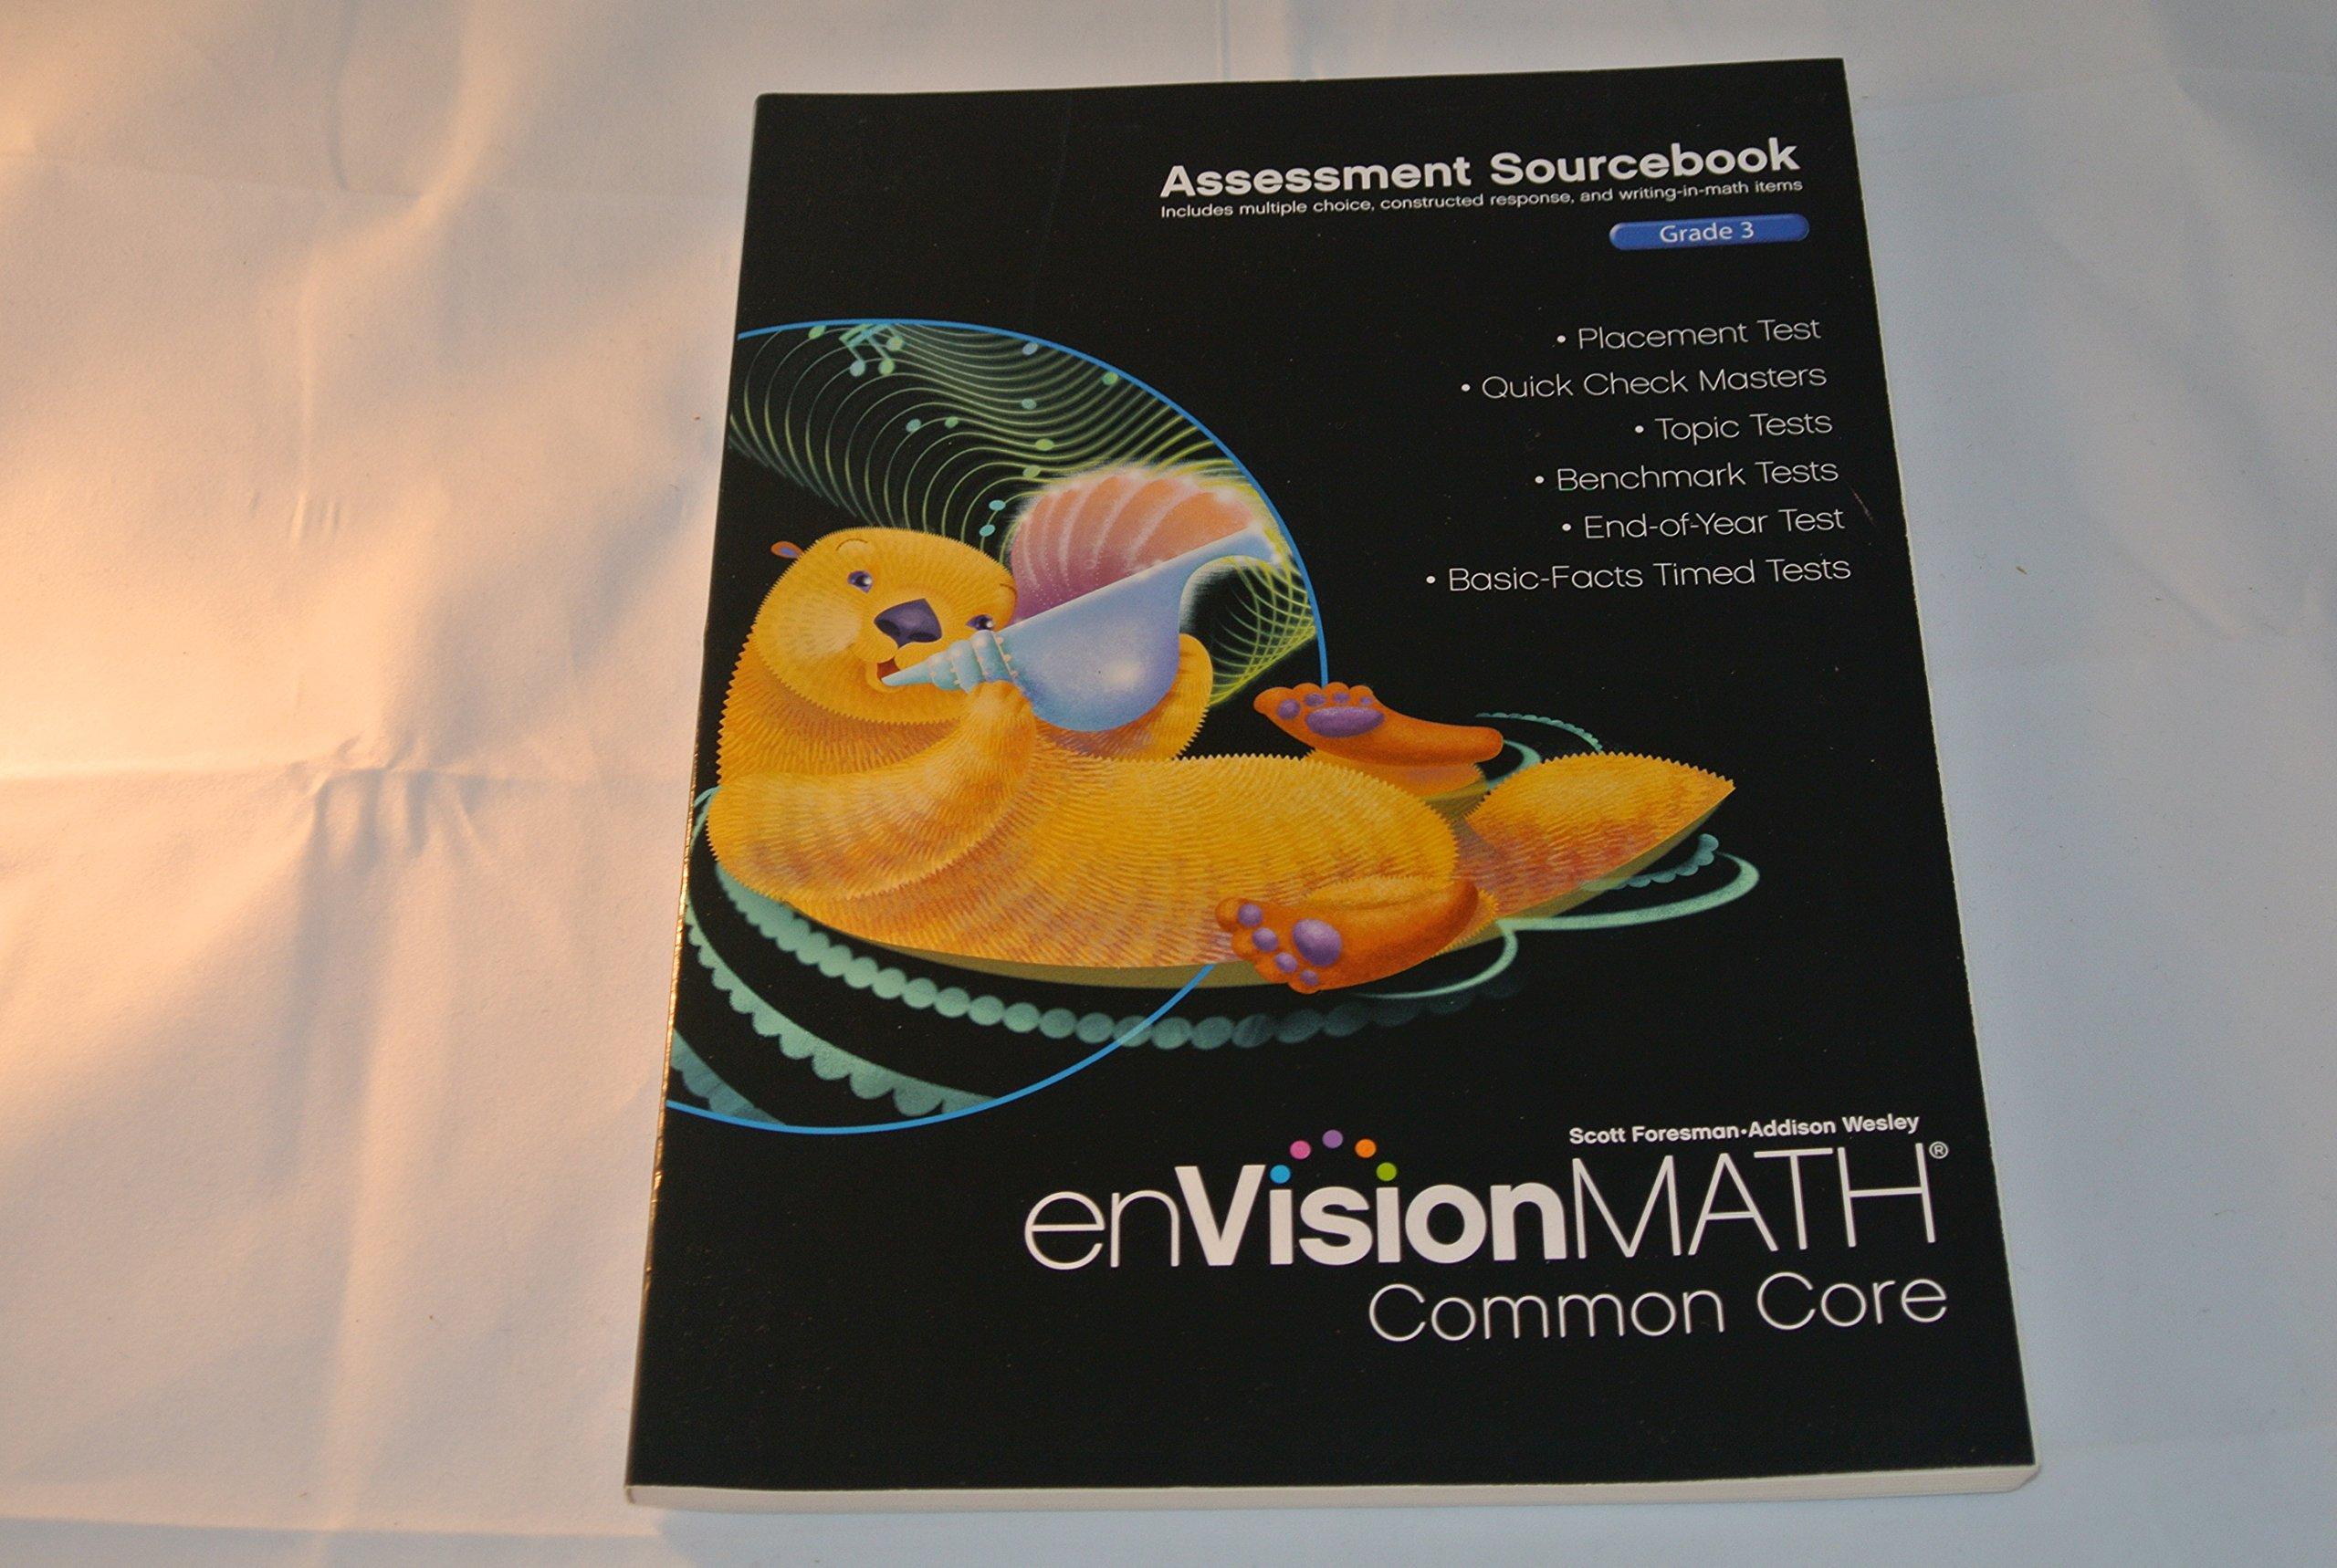 Amazon Com Envision Math Common Core Assessment Sourcebook Grade 3 Envision Math Common Core 9780328731343 Scott Foresman Addison Wesley Books